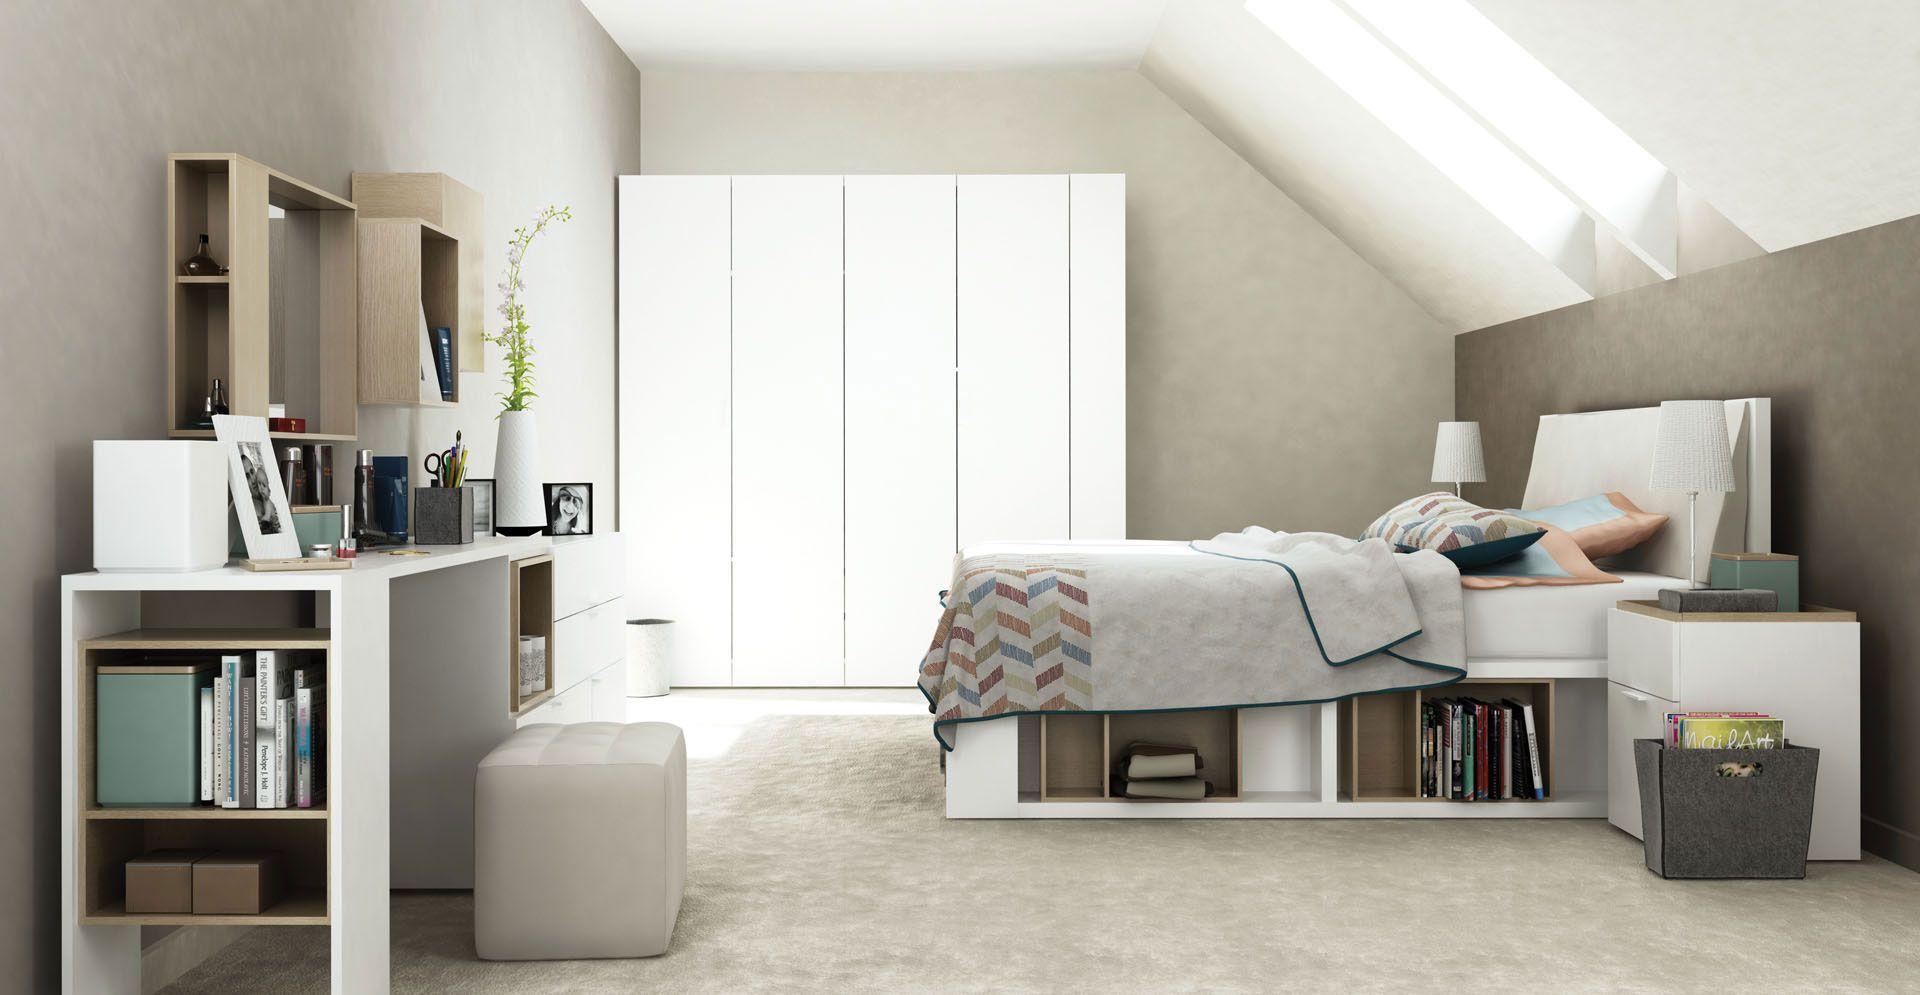 Schlafzimmer Komplett - Set C Minnea inkl. Rahmenlattenrost, 9-teilig, Farbe: Weiß / Eiche